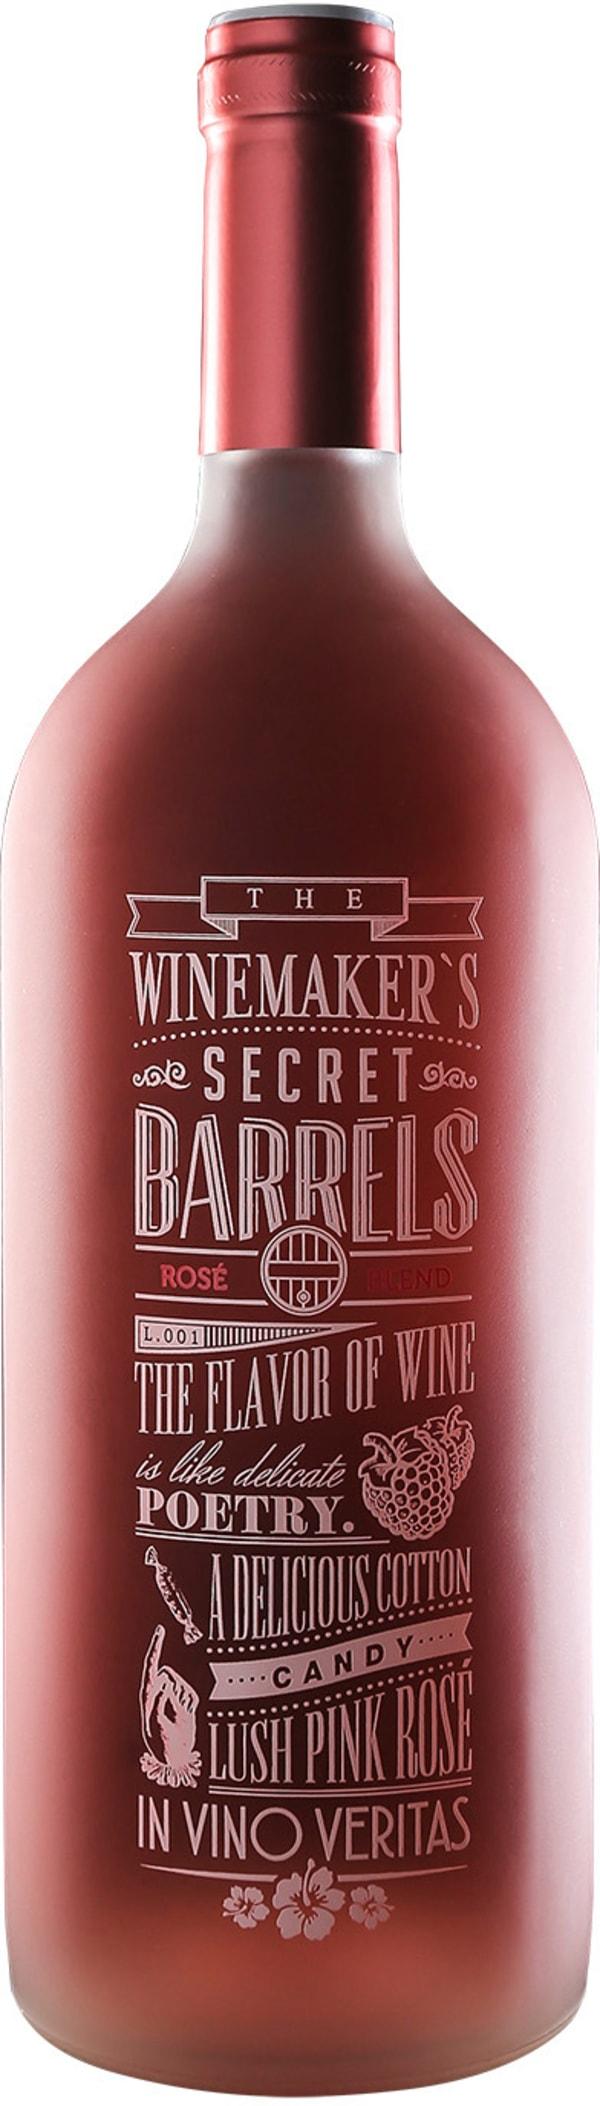 The Winemaker's Secret Barrels Rosé